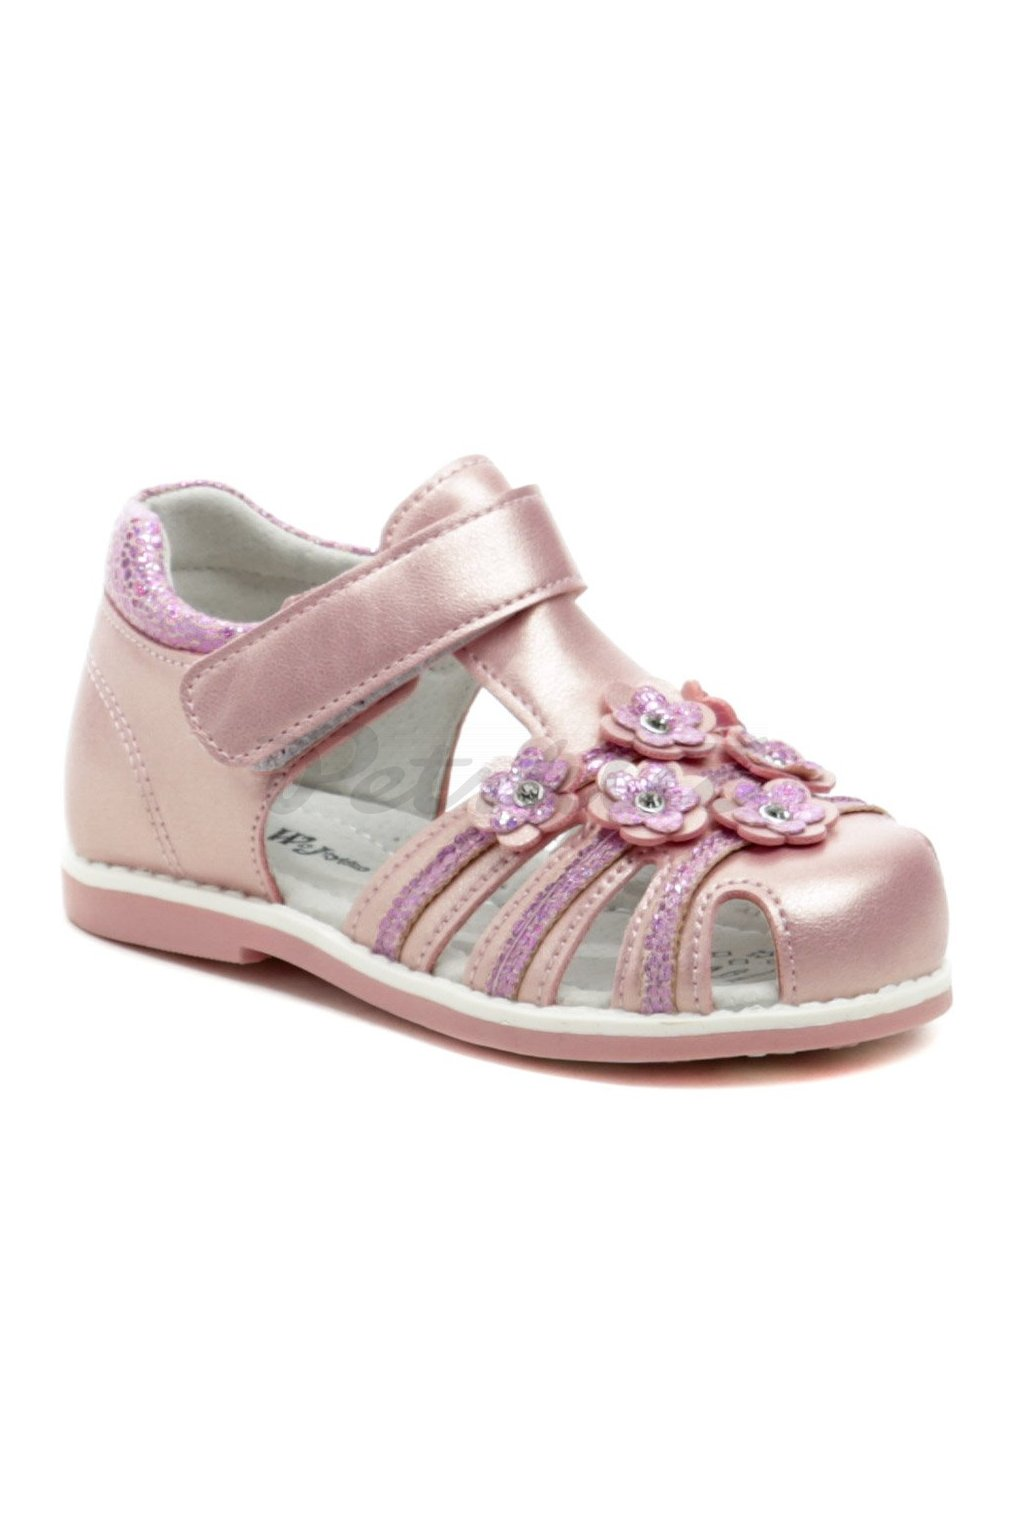 Wojtylko 1S41021 růžové sandálky